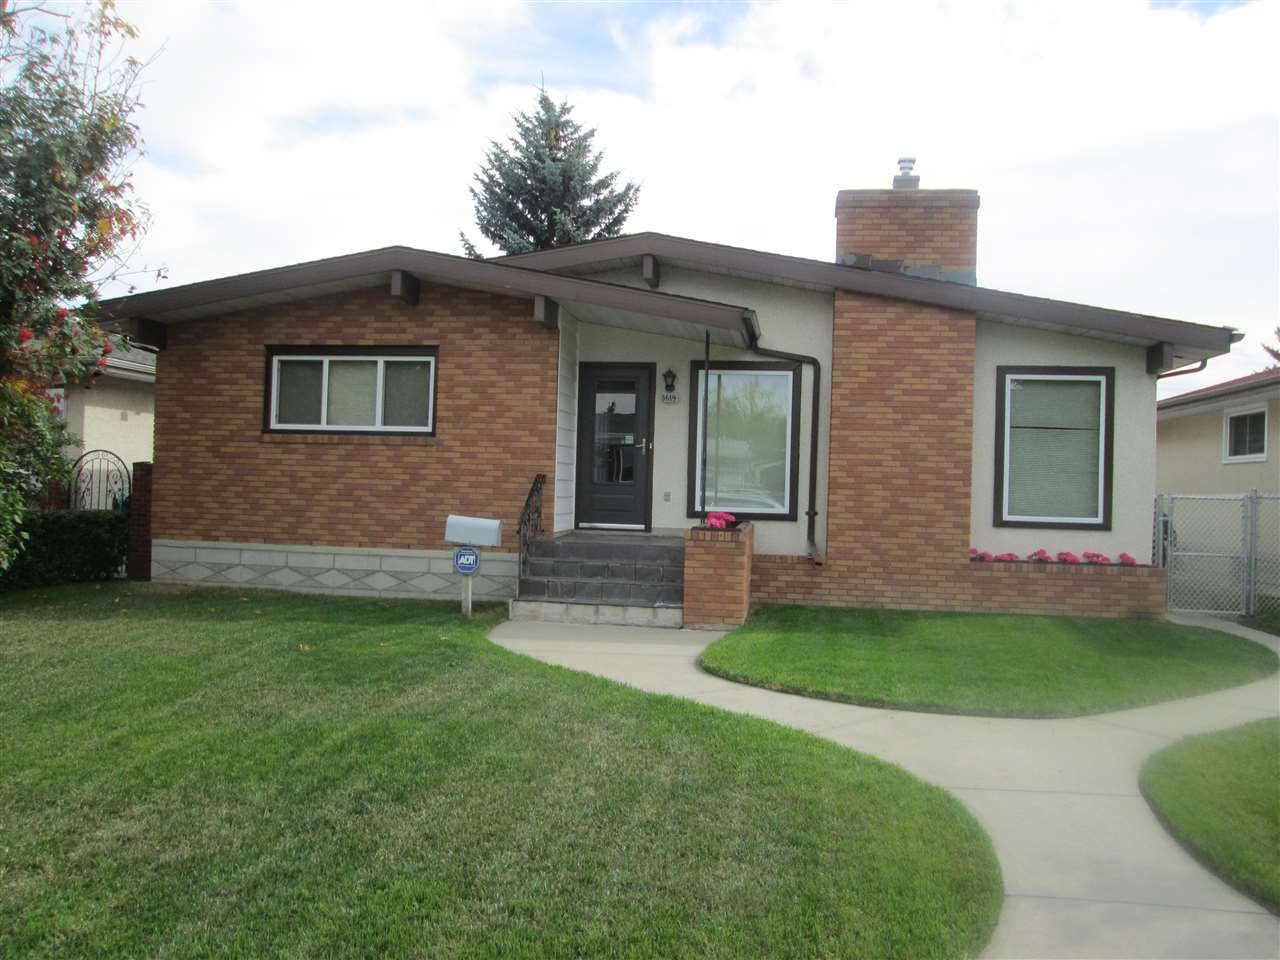 Main Photo: 3619 108 Street in Edmonton: Zone 16 House for sale : MLS®# E4173957